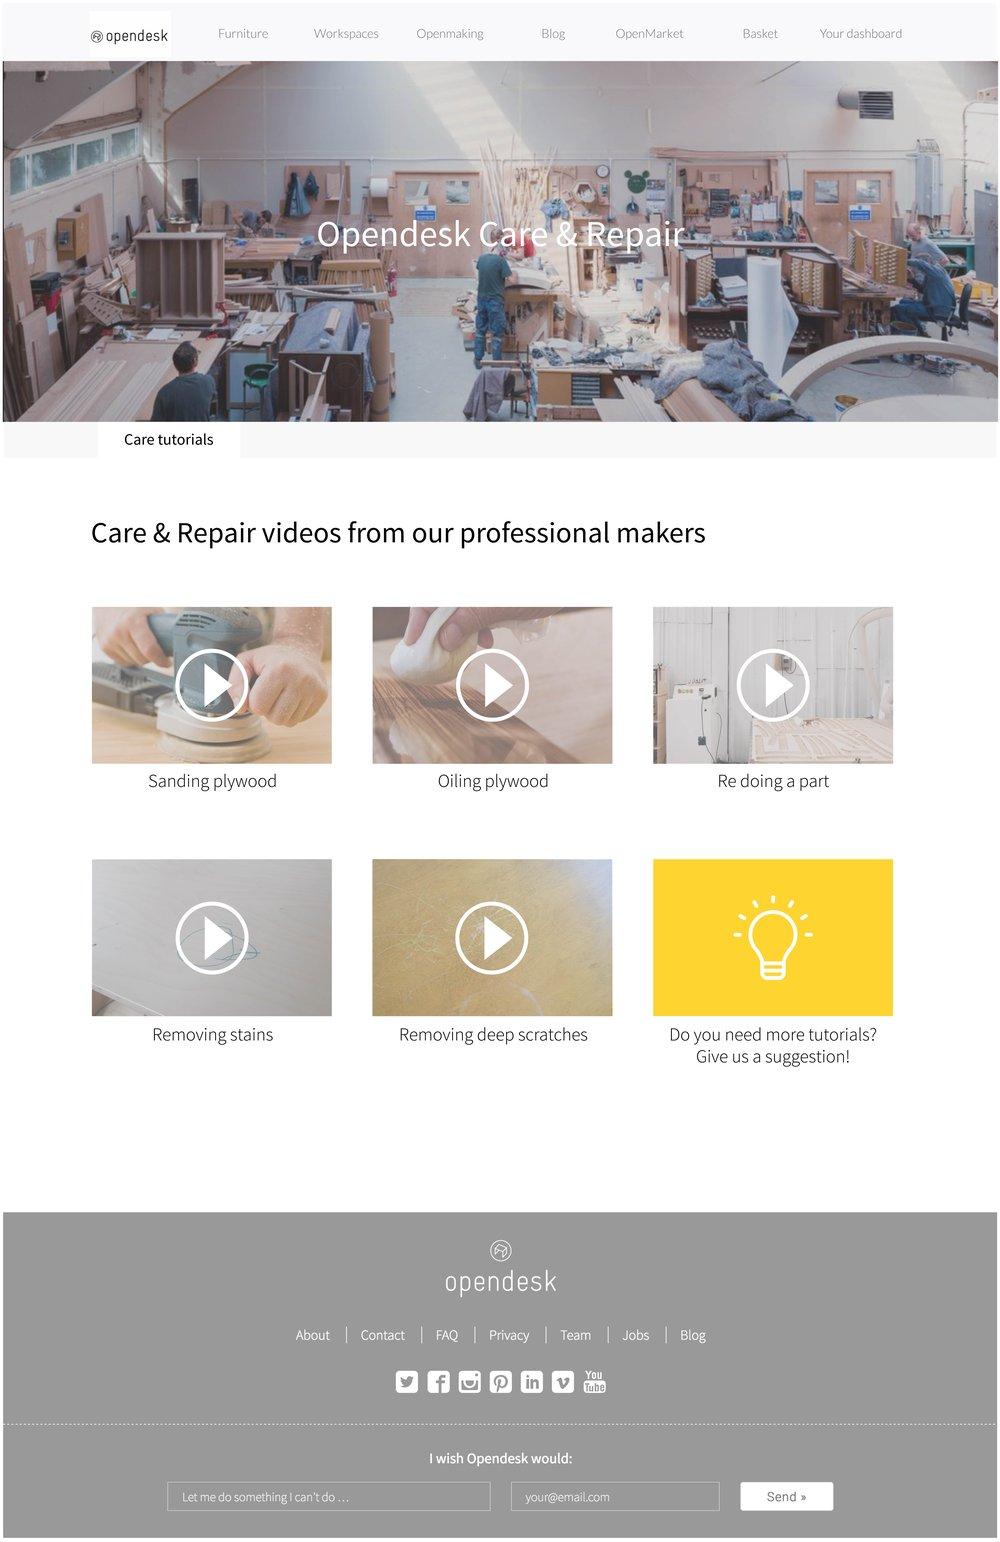 Care & Aftercare platform - Design for longevity